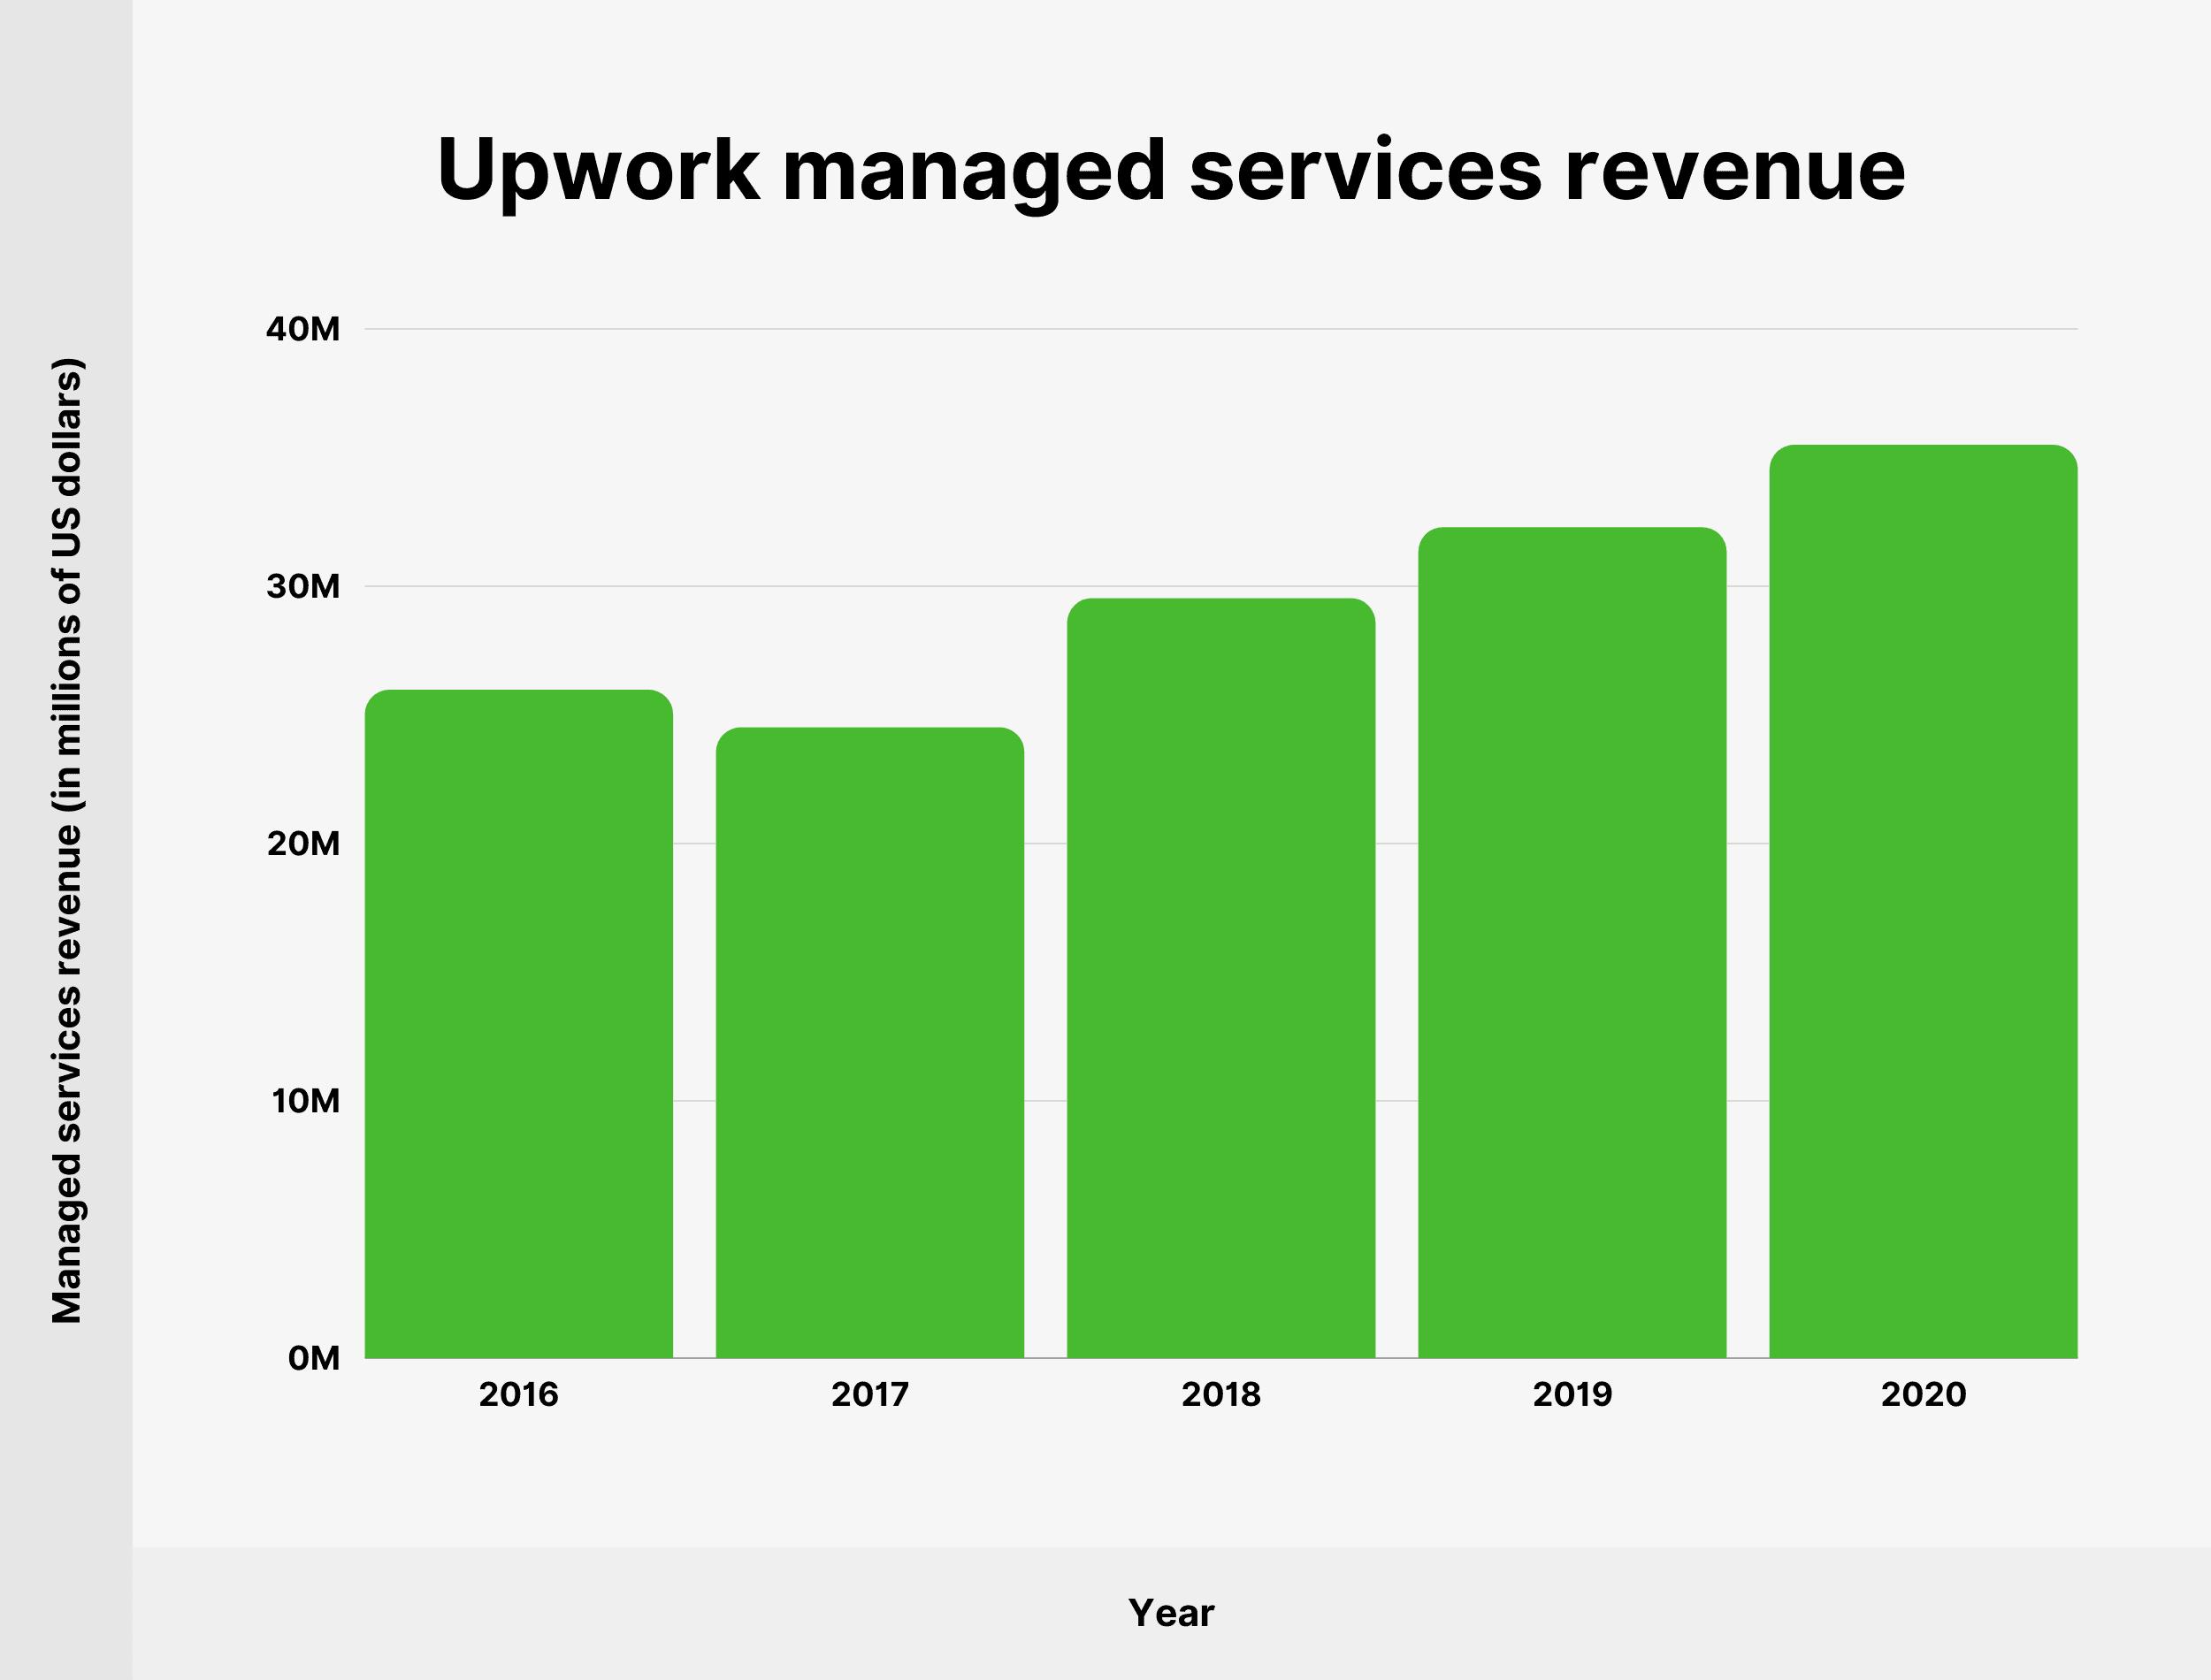 Upwork managed services revenue